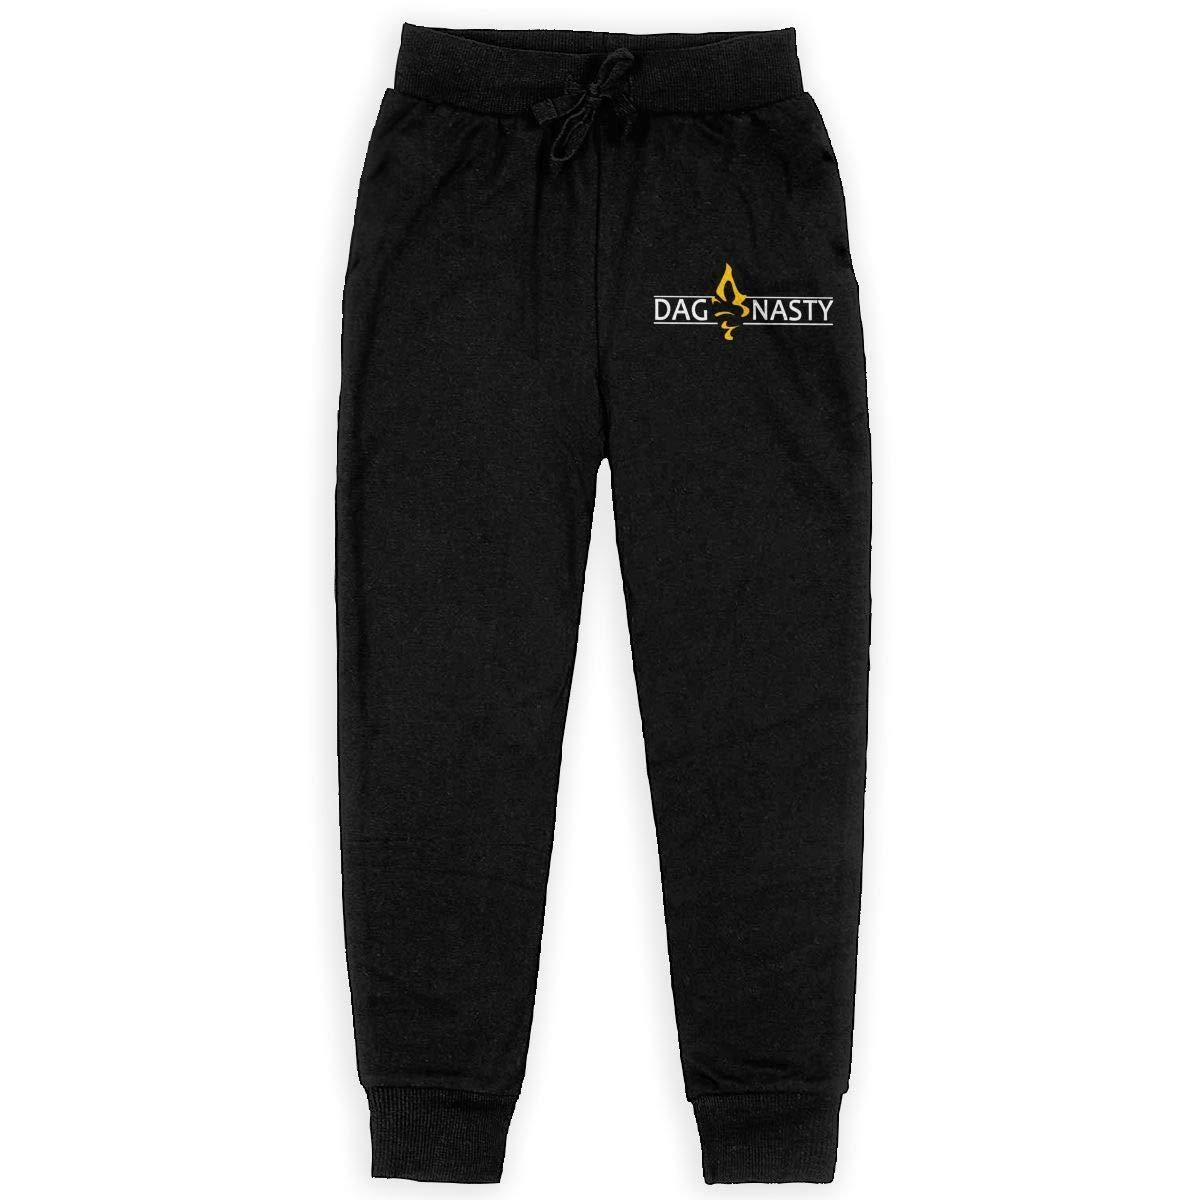 Big Boys Girls Casual Jogger Soft Training Pants Elastic Waist Deftones Logo